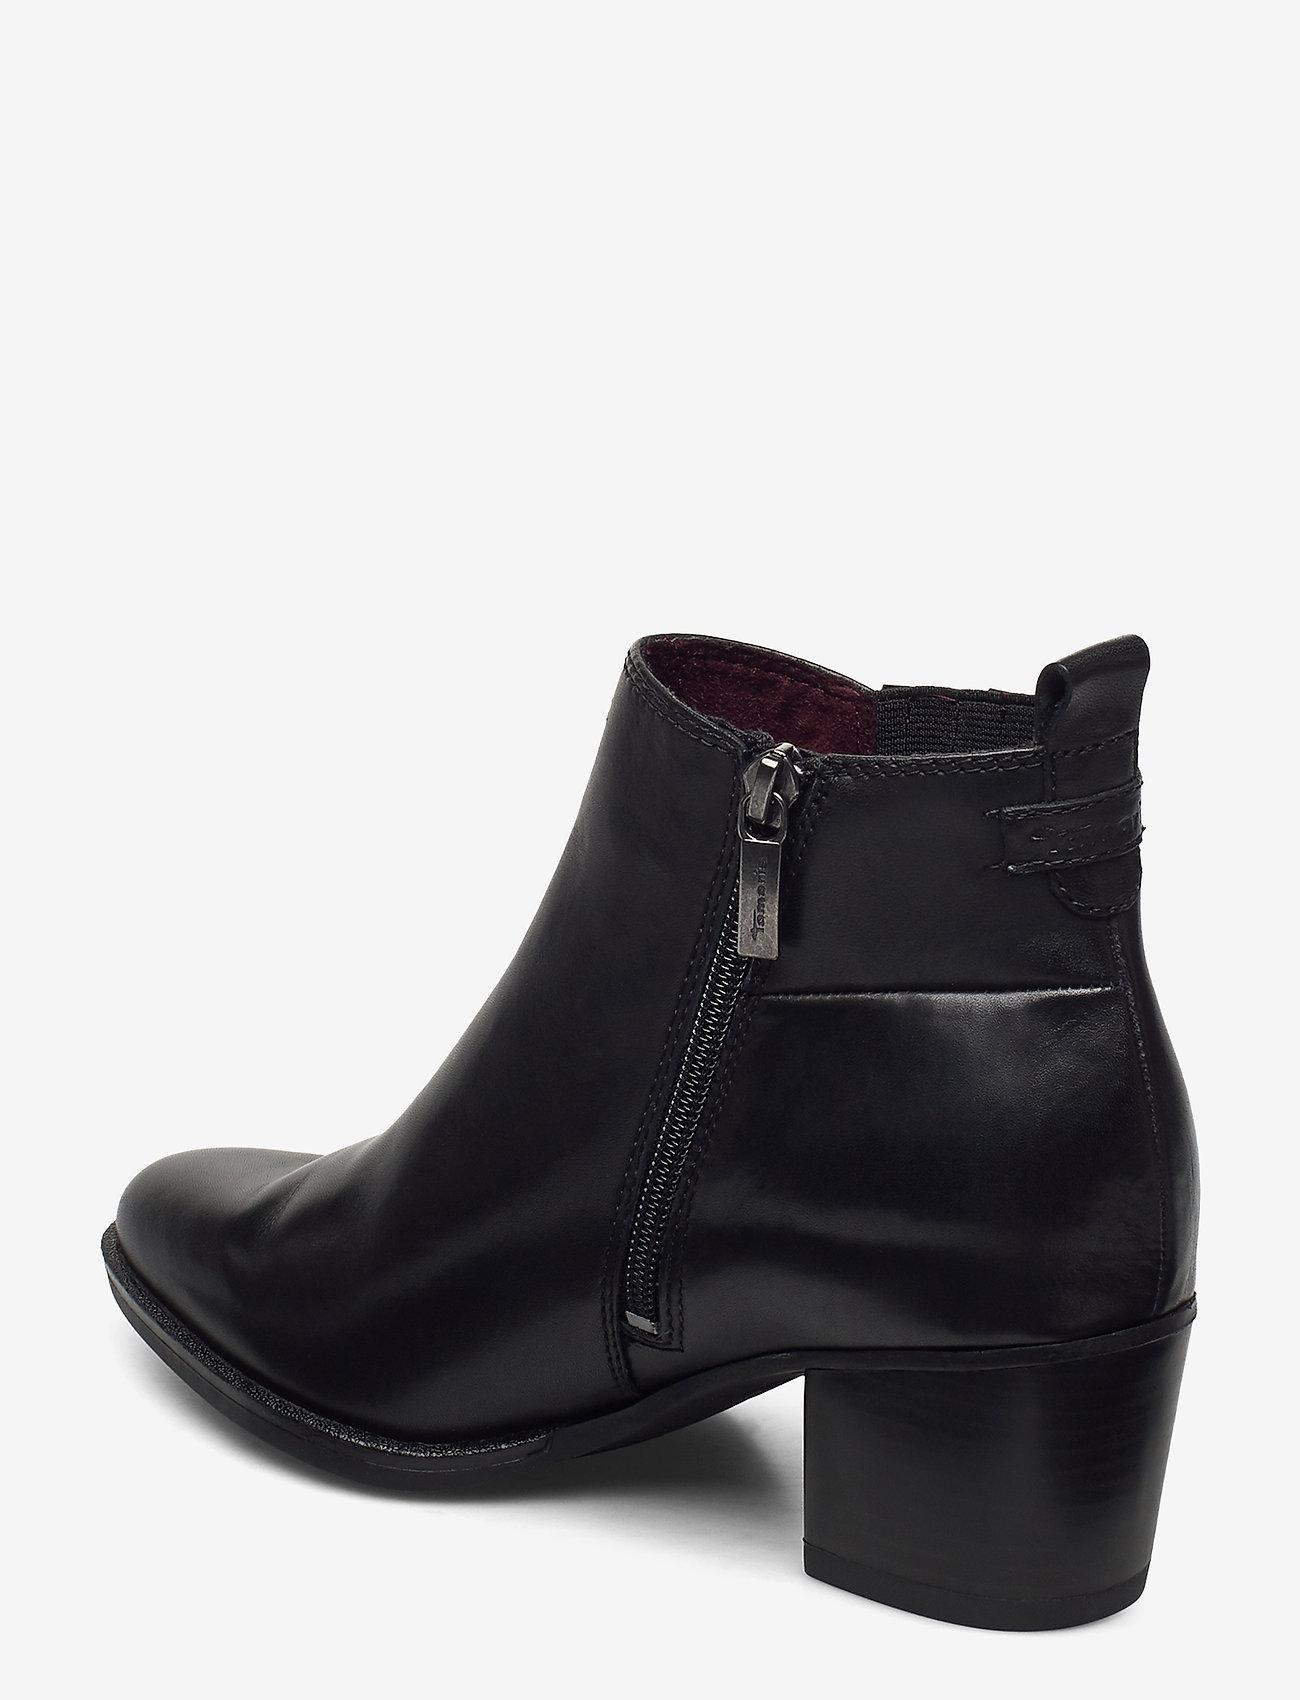 Woms Boots (Black) (62.97 €) - Tamaris sofd2